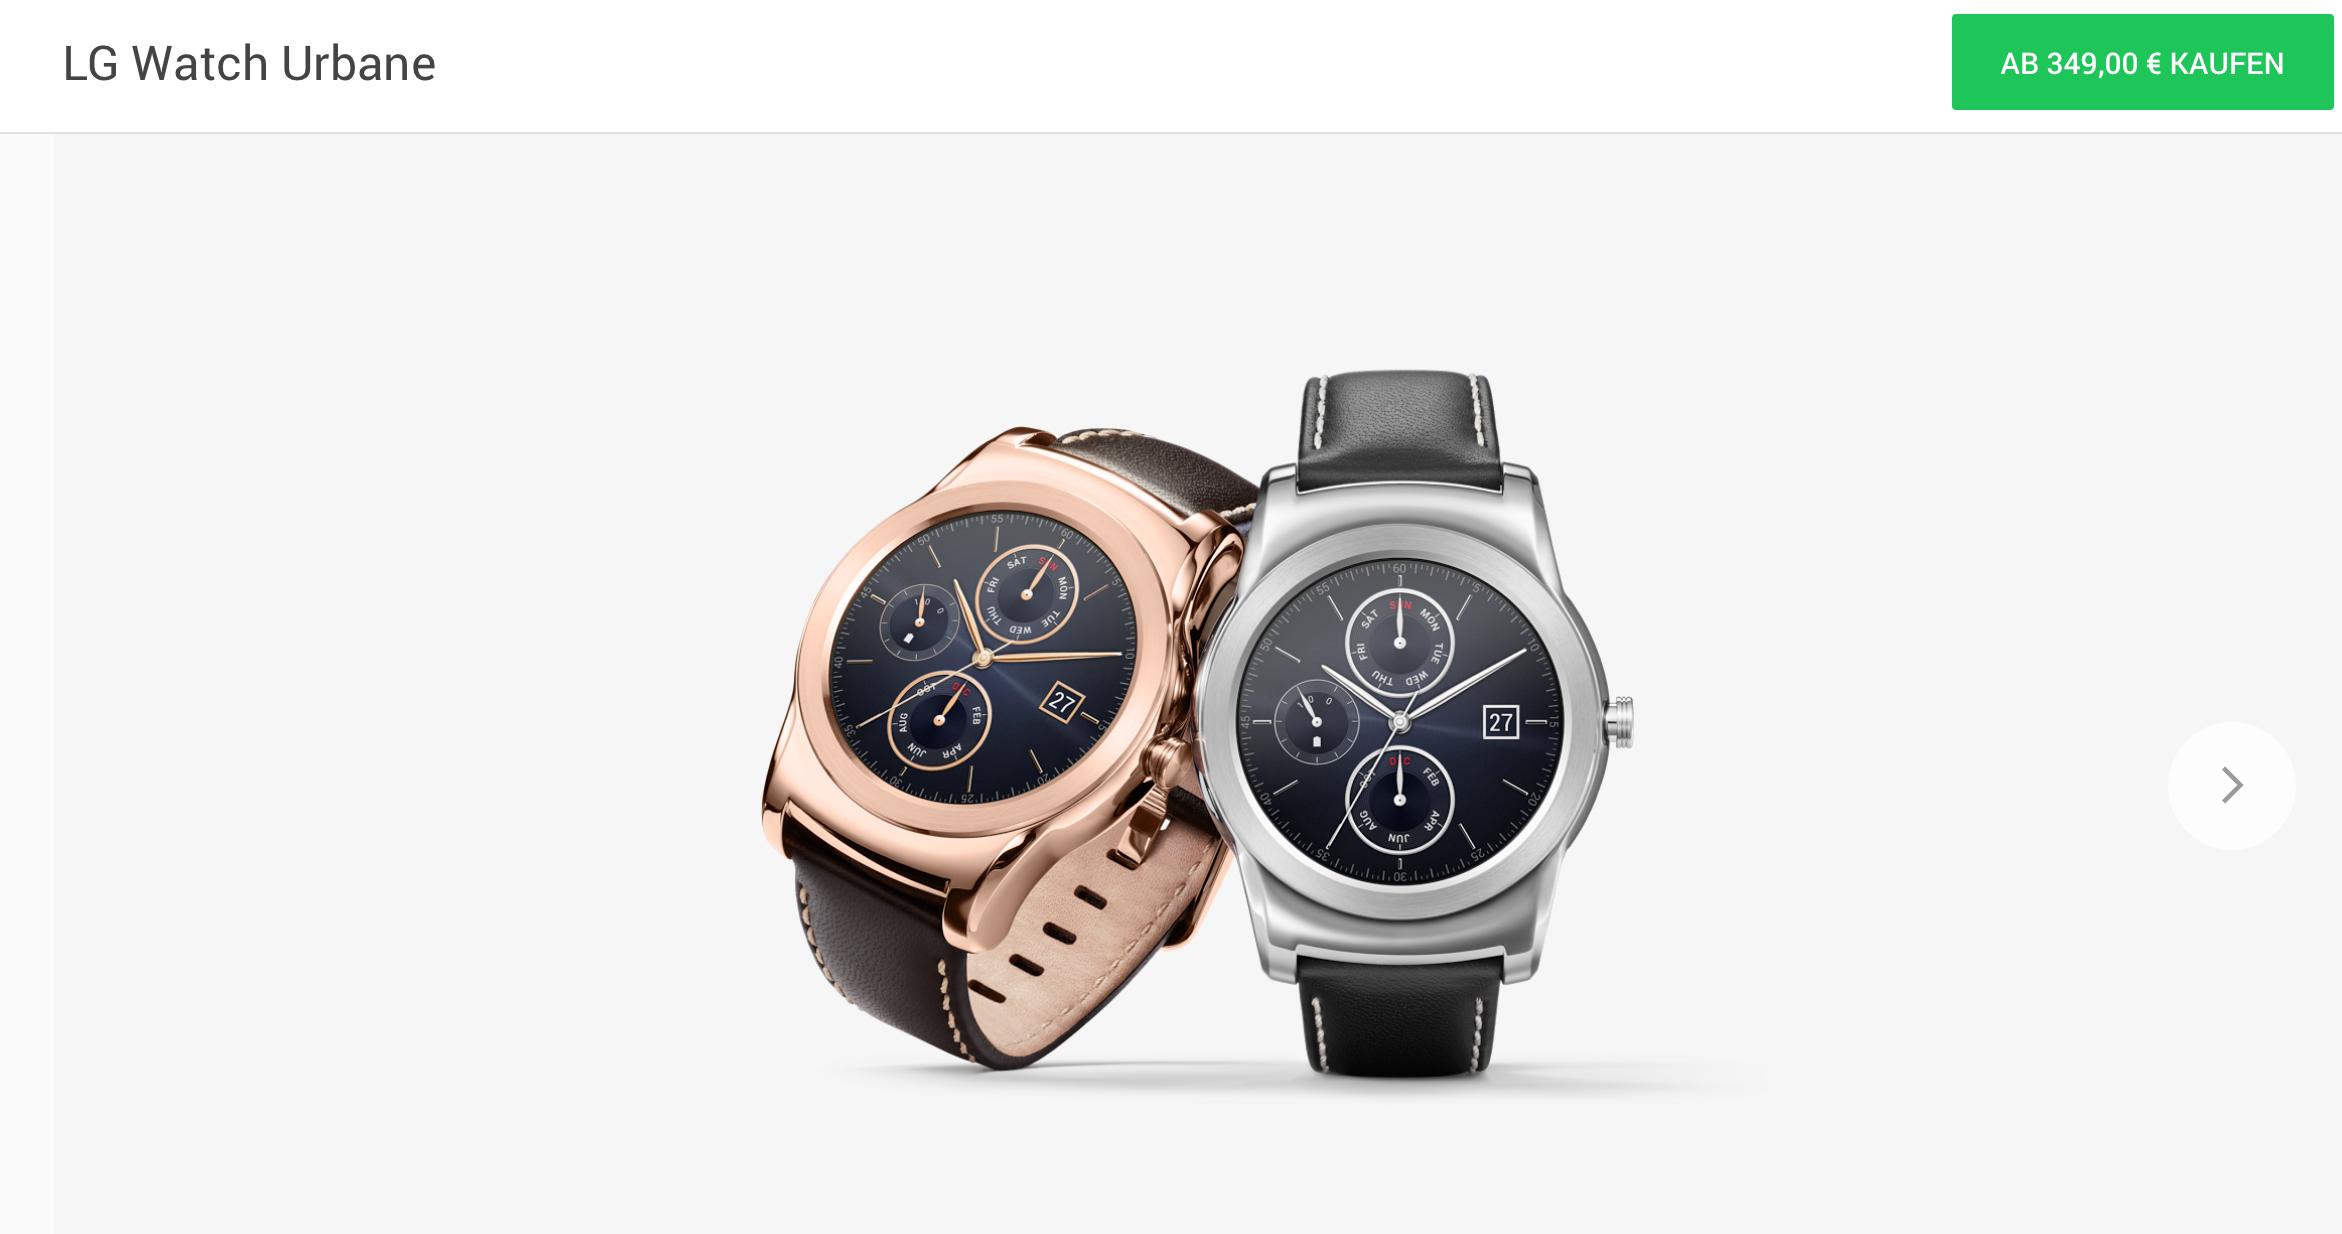 LG Watch Urbane im Google Store